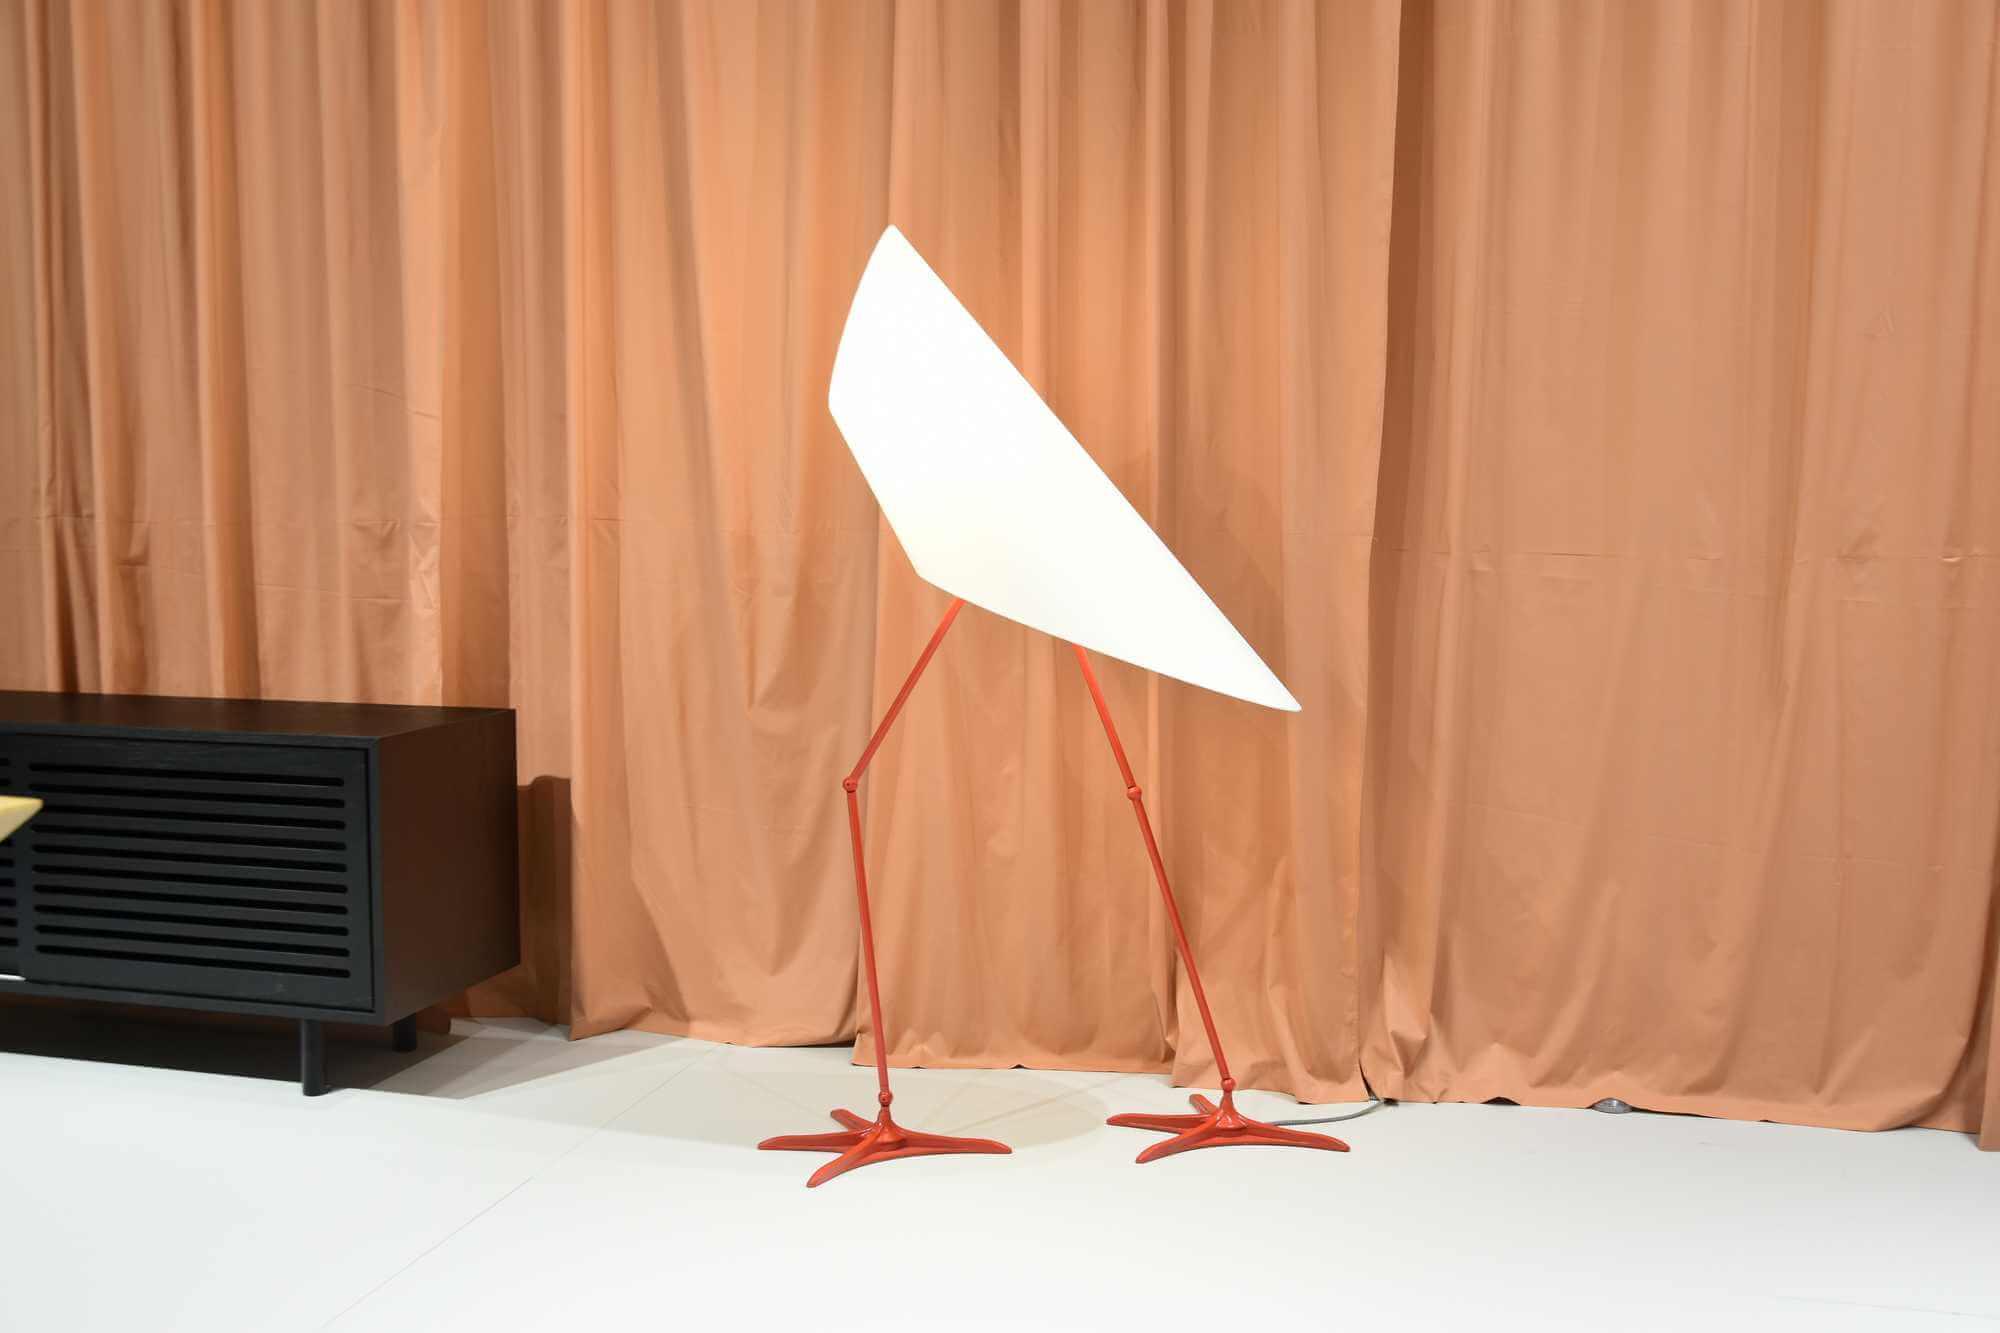 lampa stojąca bocian STORK